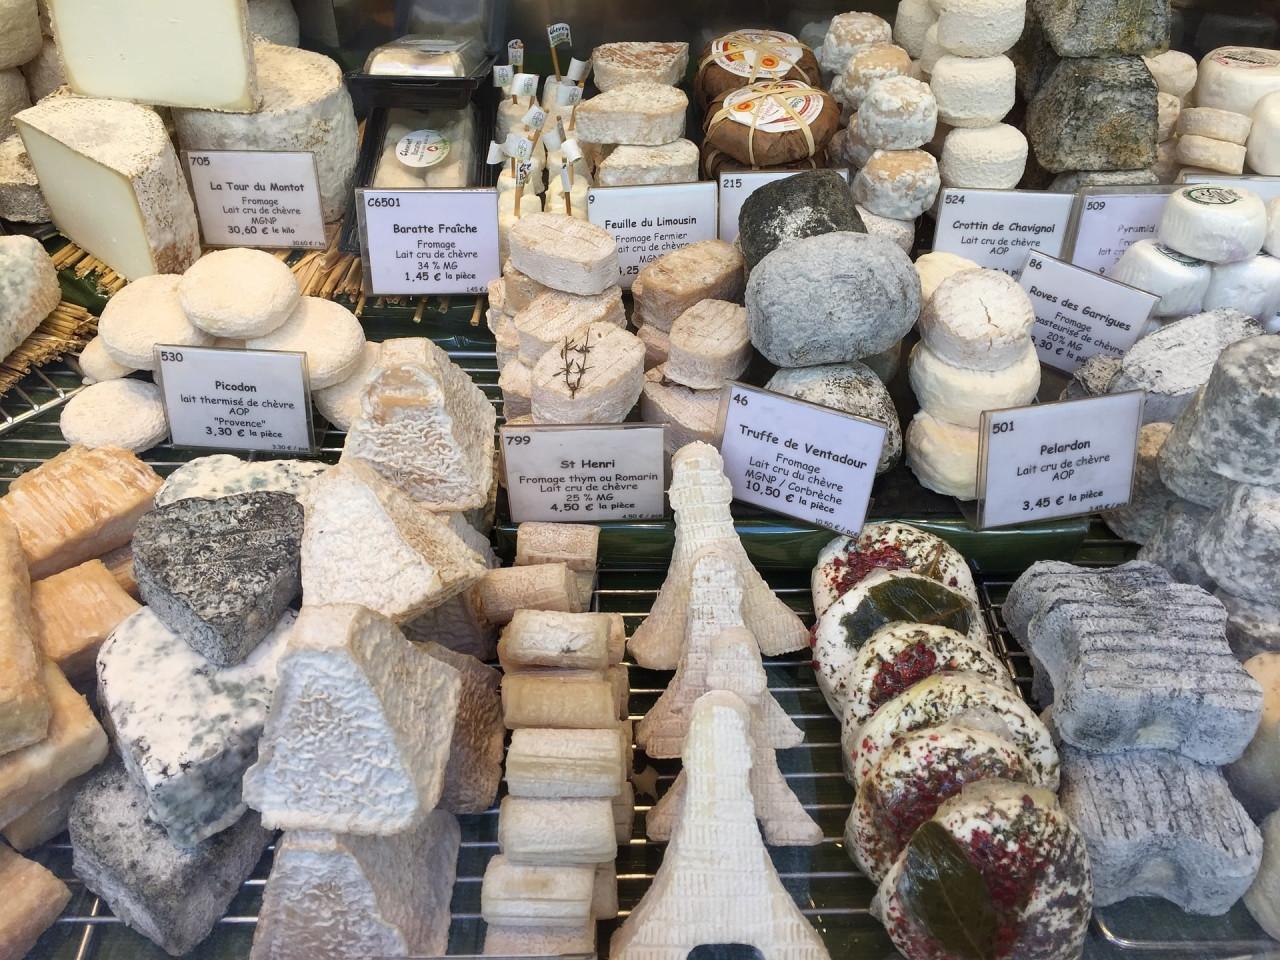 Le cinque migliori fromageries di Parigi da visitare assolutamente